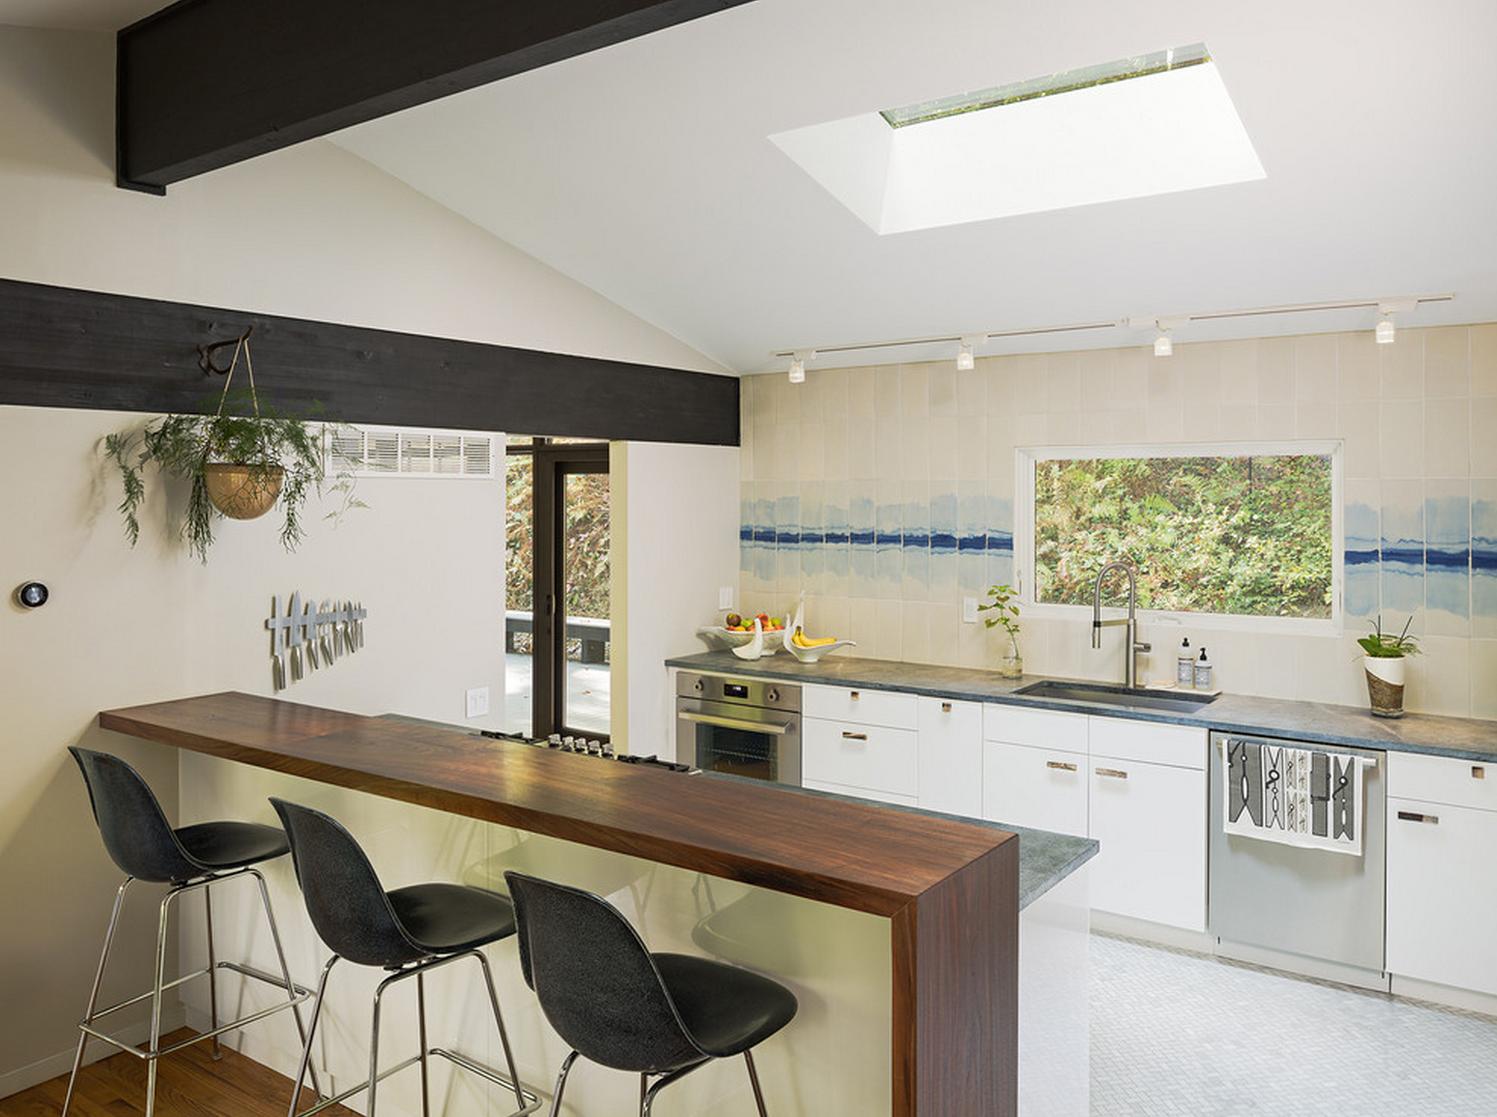 Kitchen Desing | designedbykrystleblog